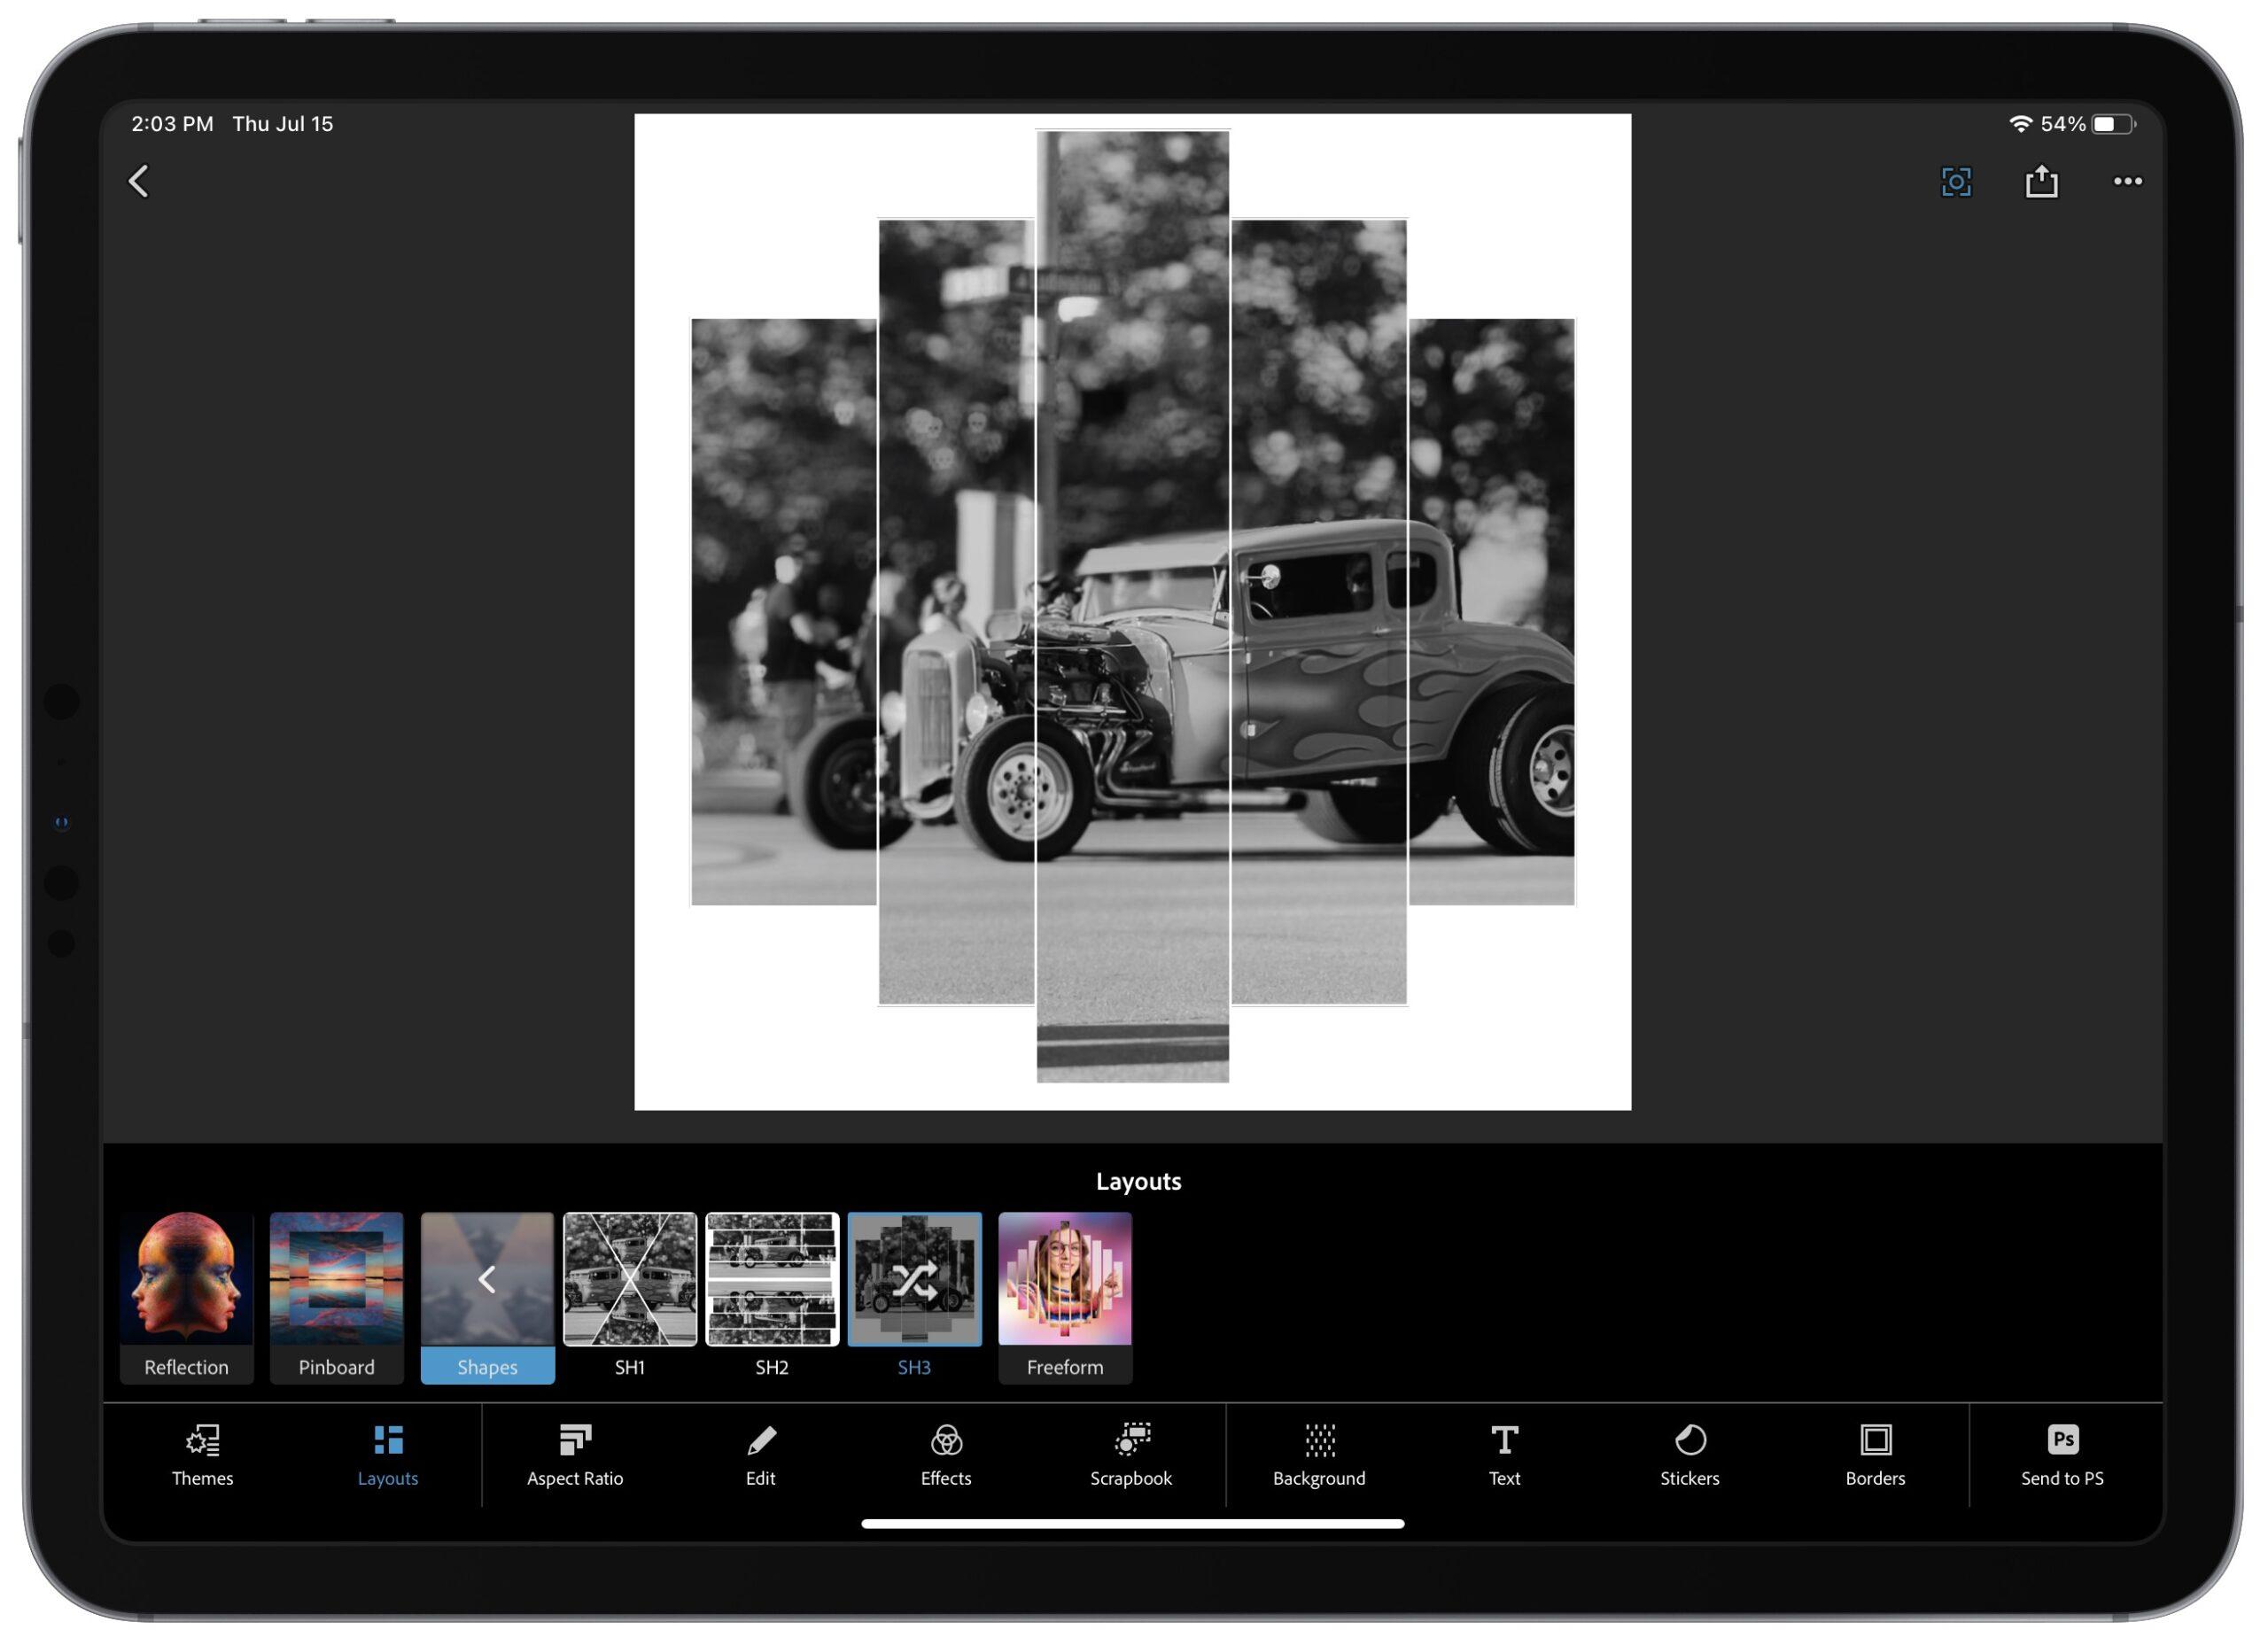 Adobe photoshop express collage tool